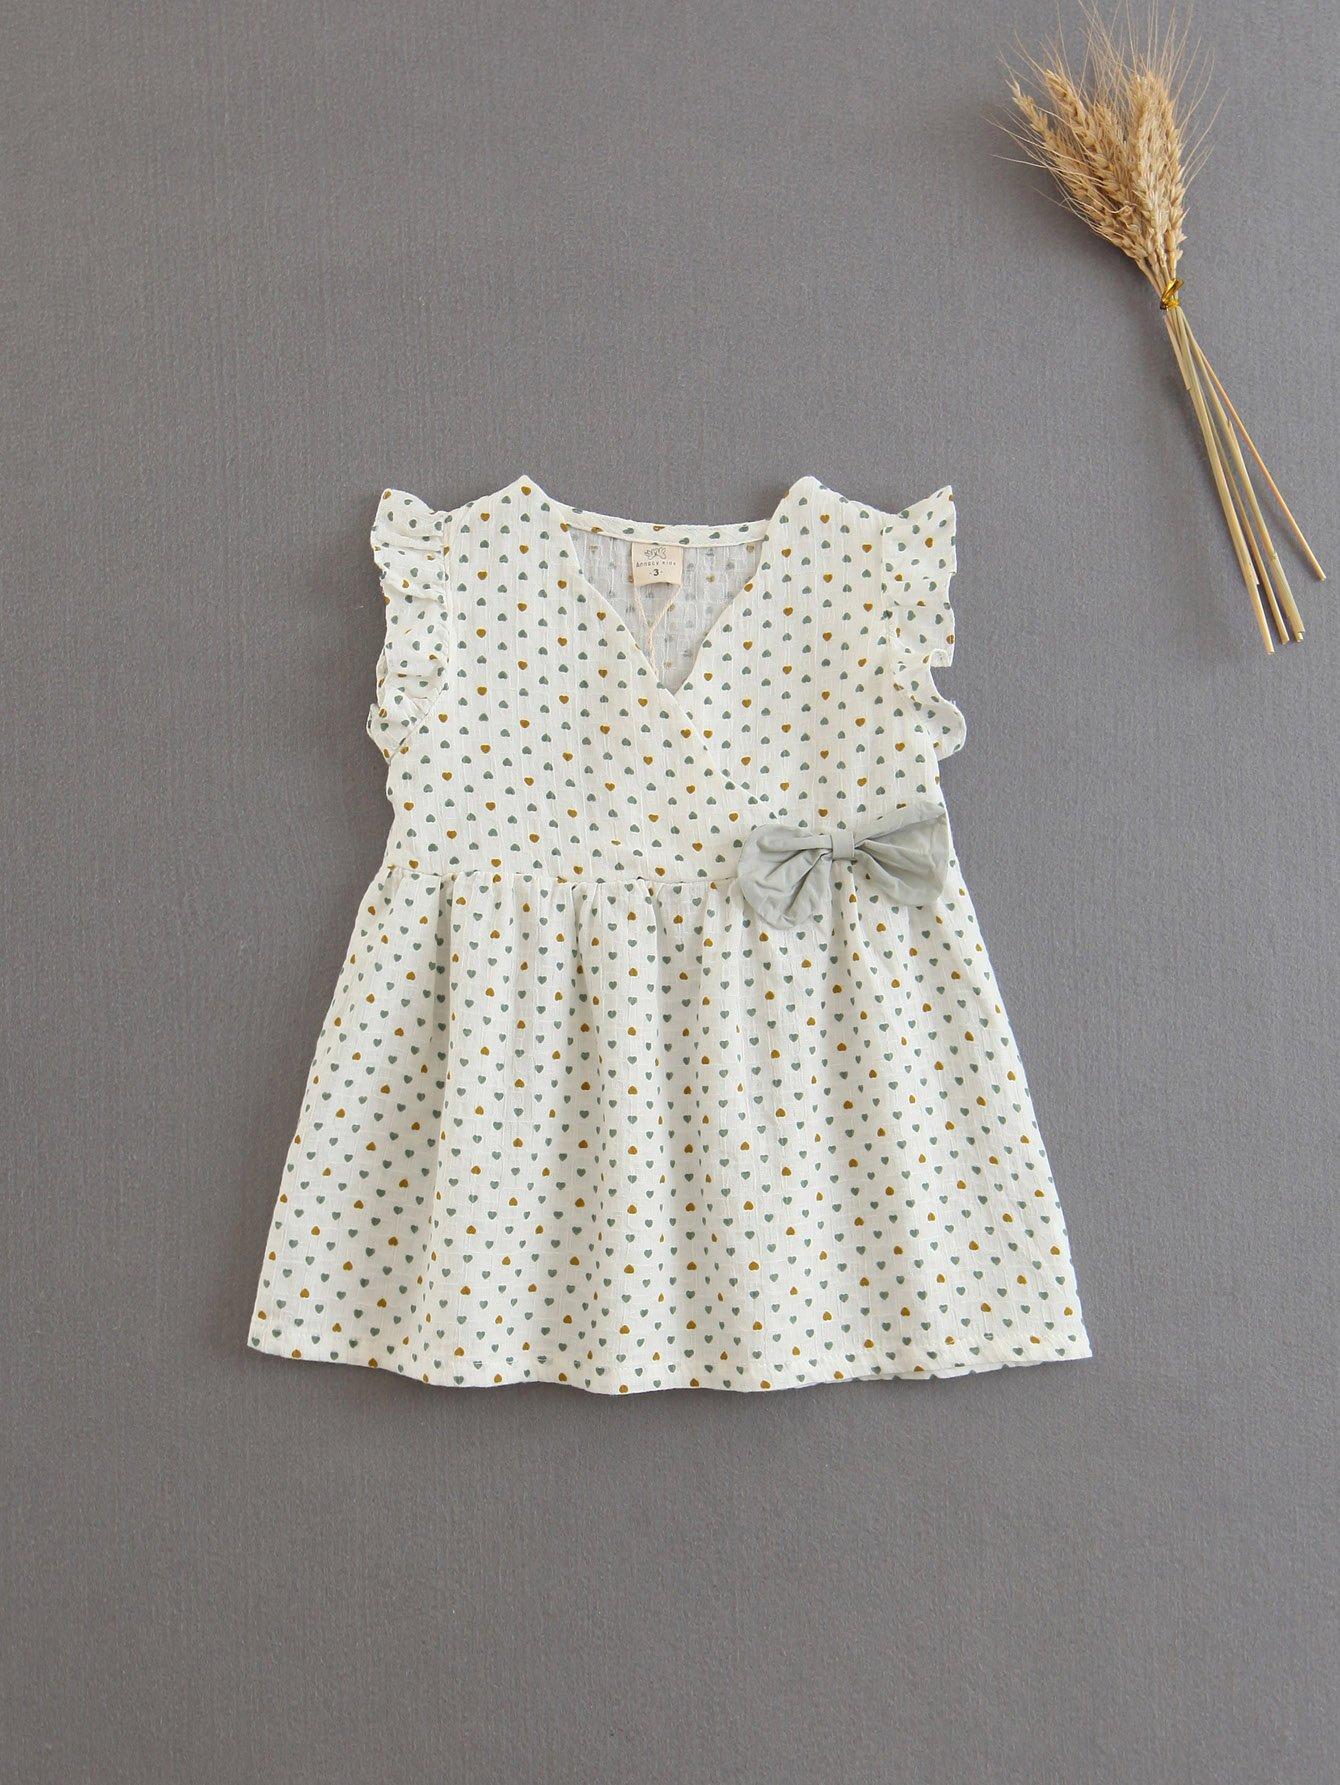 Bow Detail Heart Print Surplice Dress цена 2017